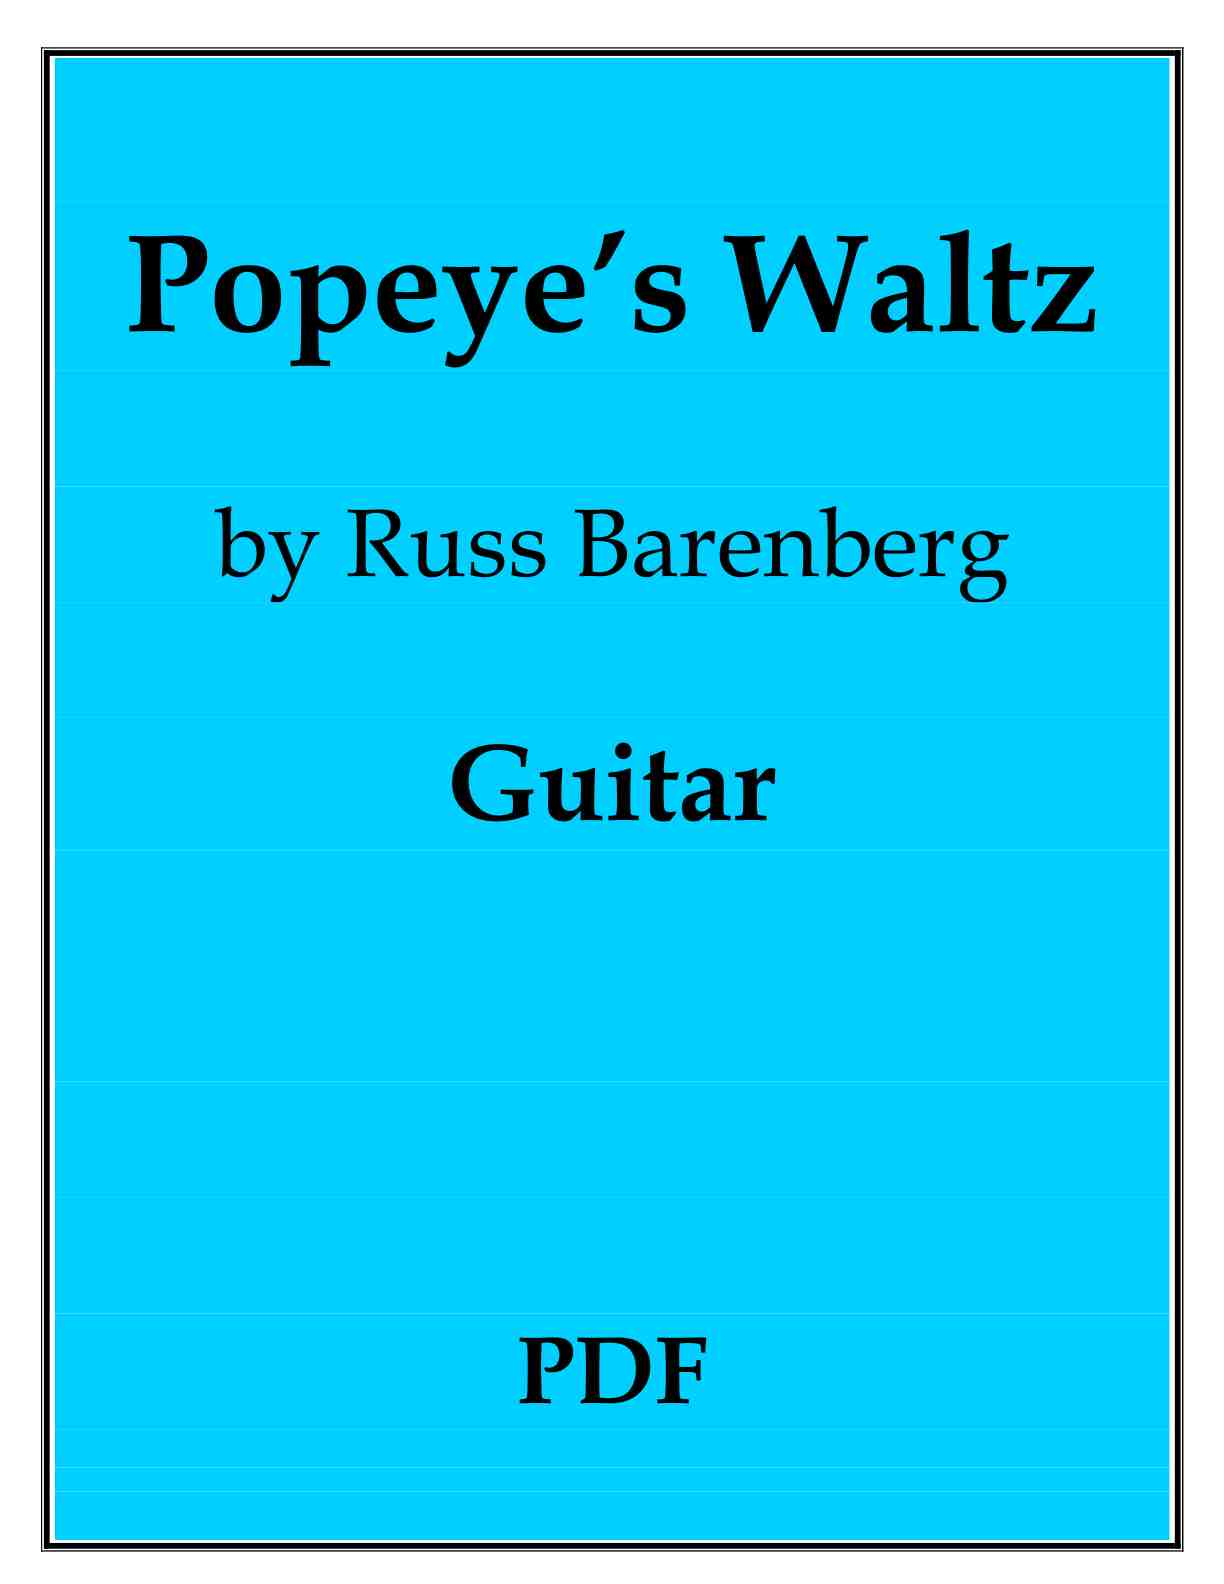 Lerner - I'm Popeye The Sailor Man sheet music for voice ... |Popeye Guitar